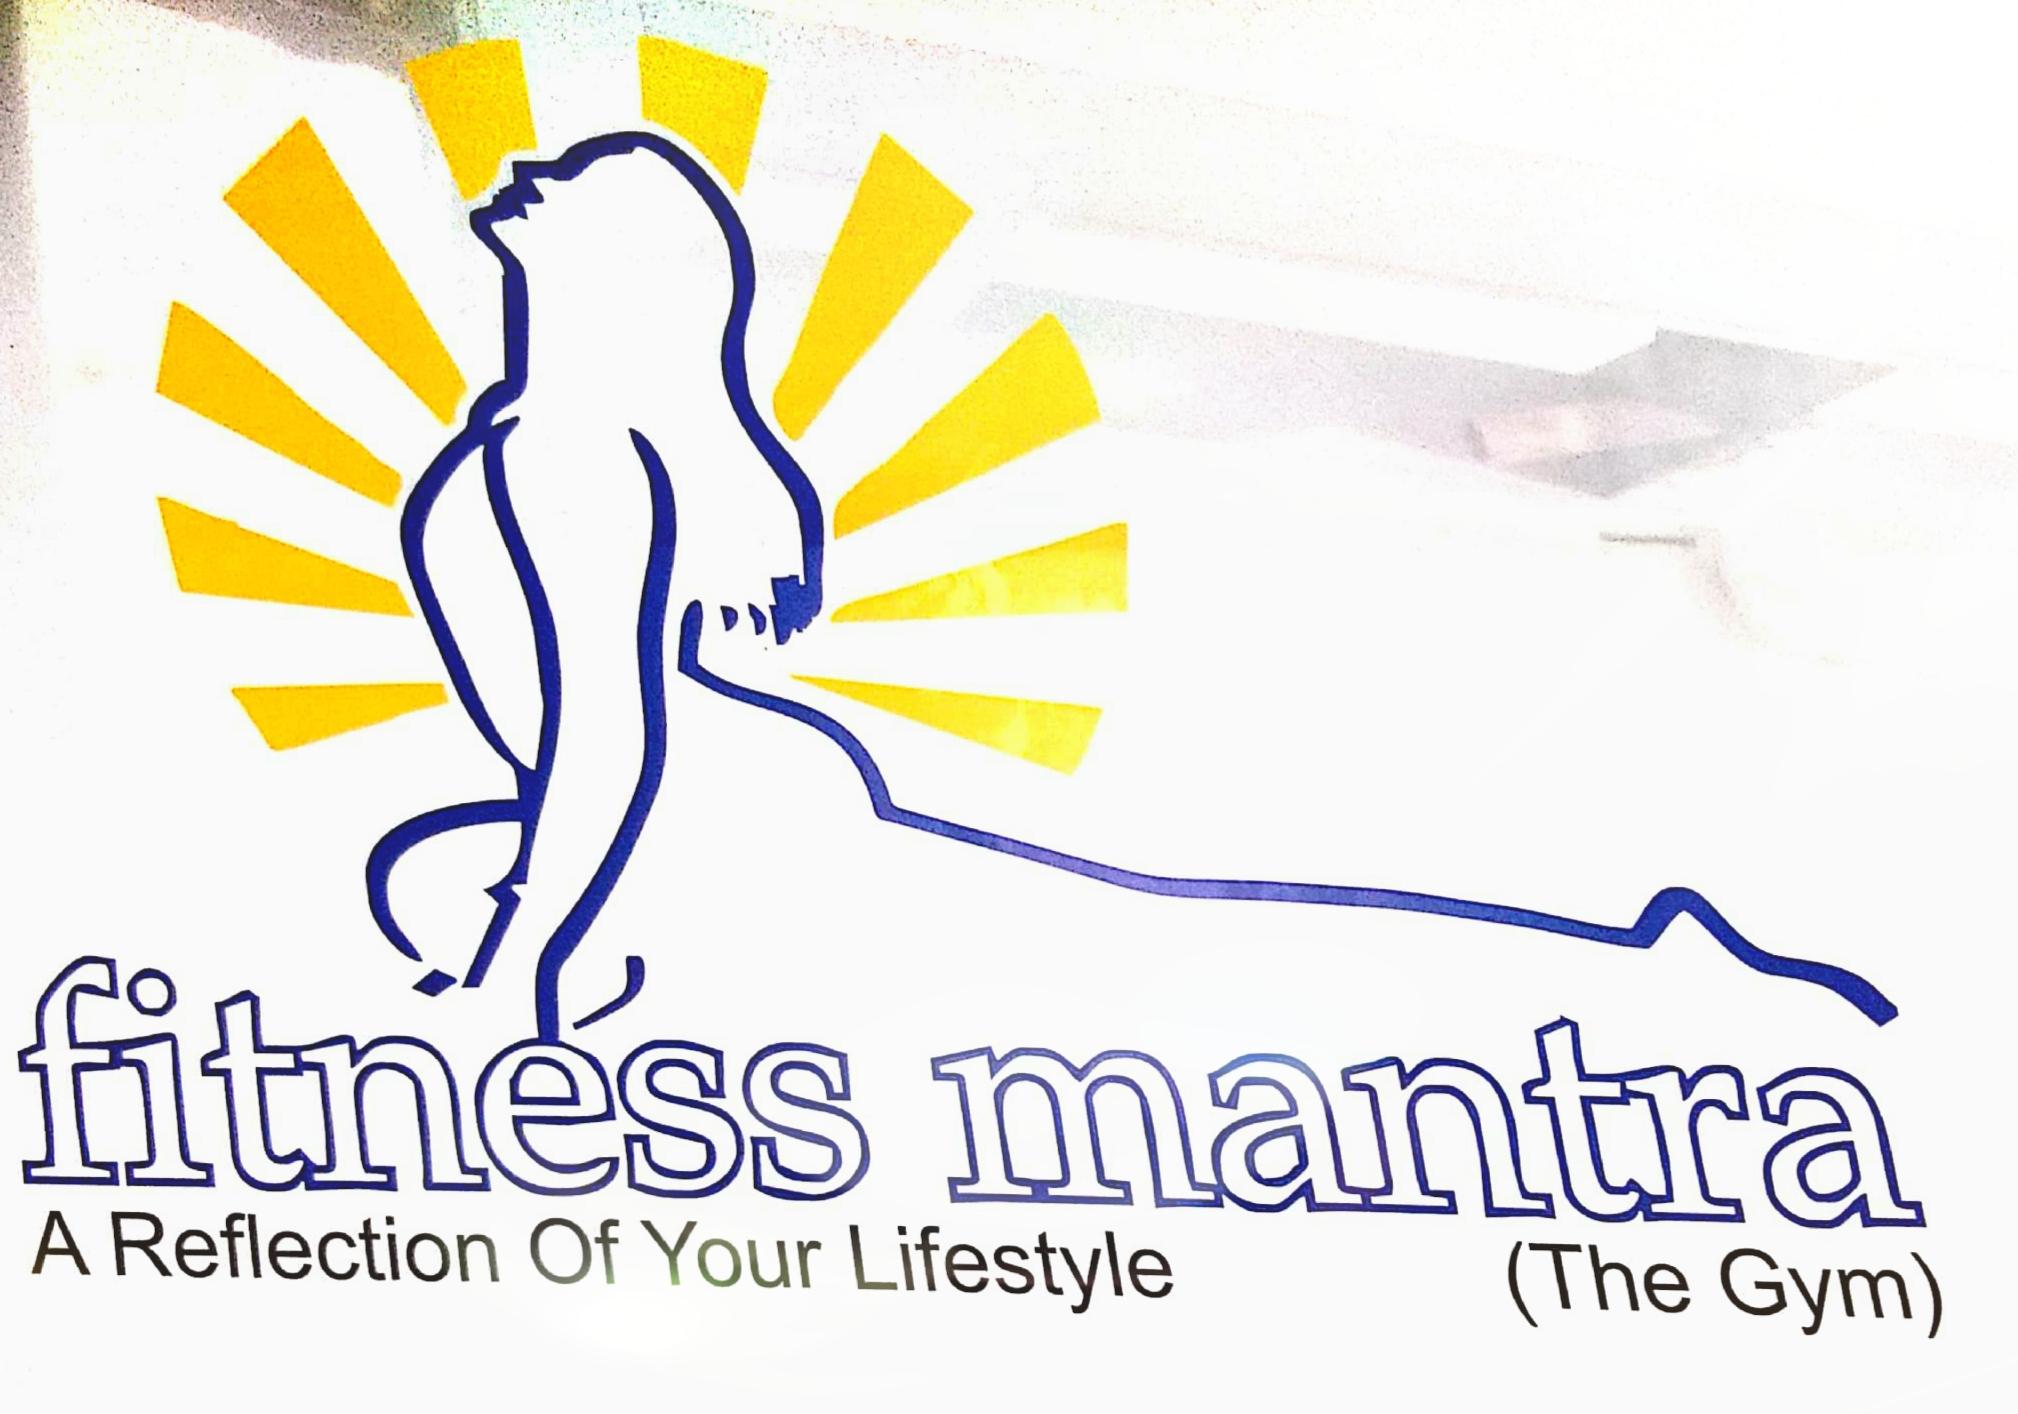 Fitness Mantra Gym